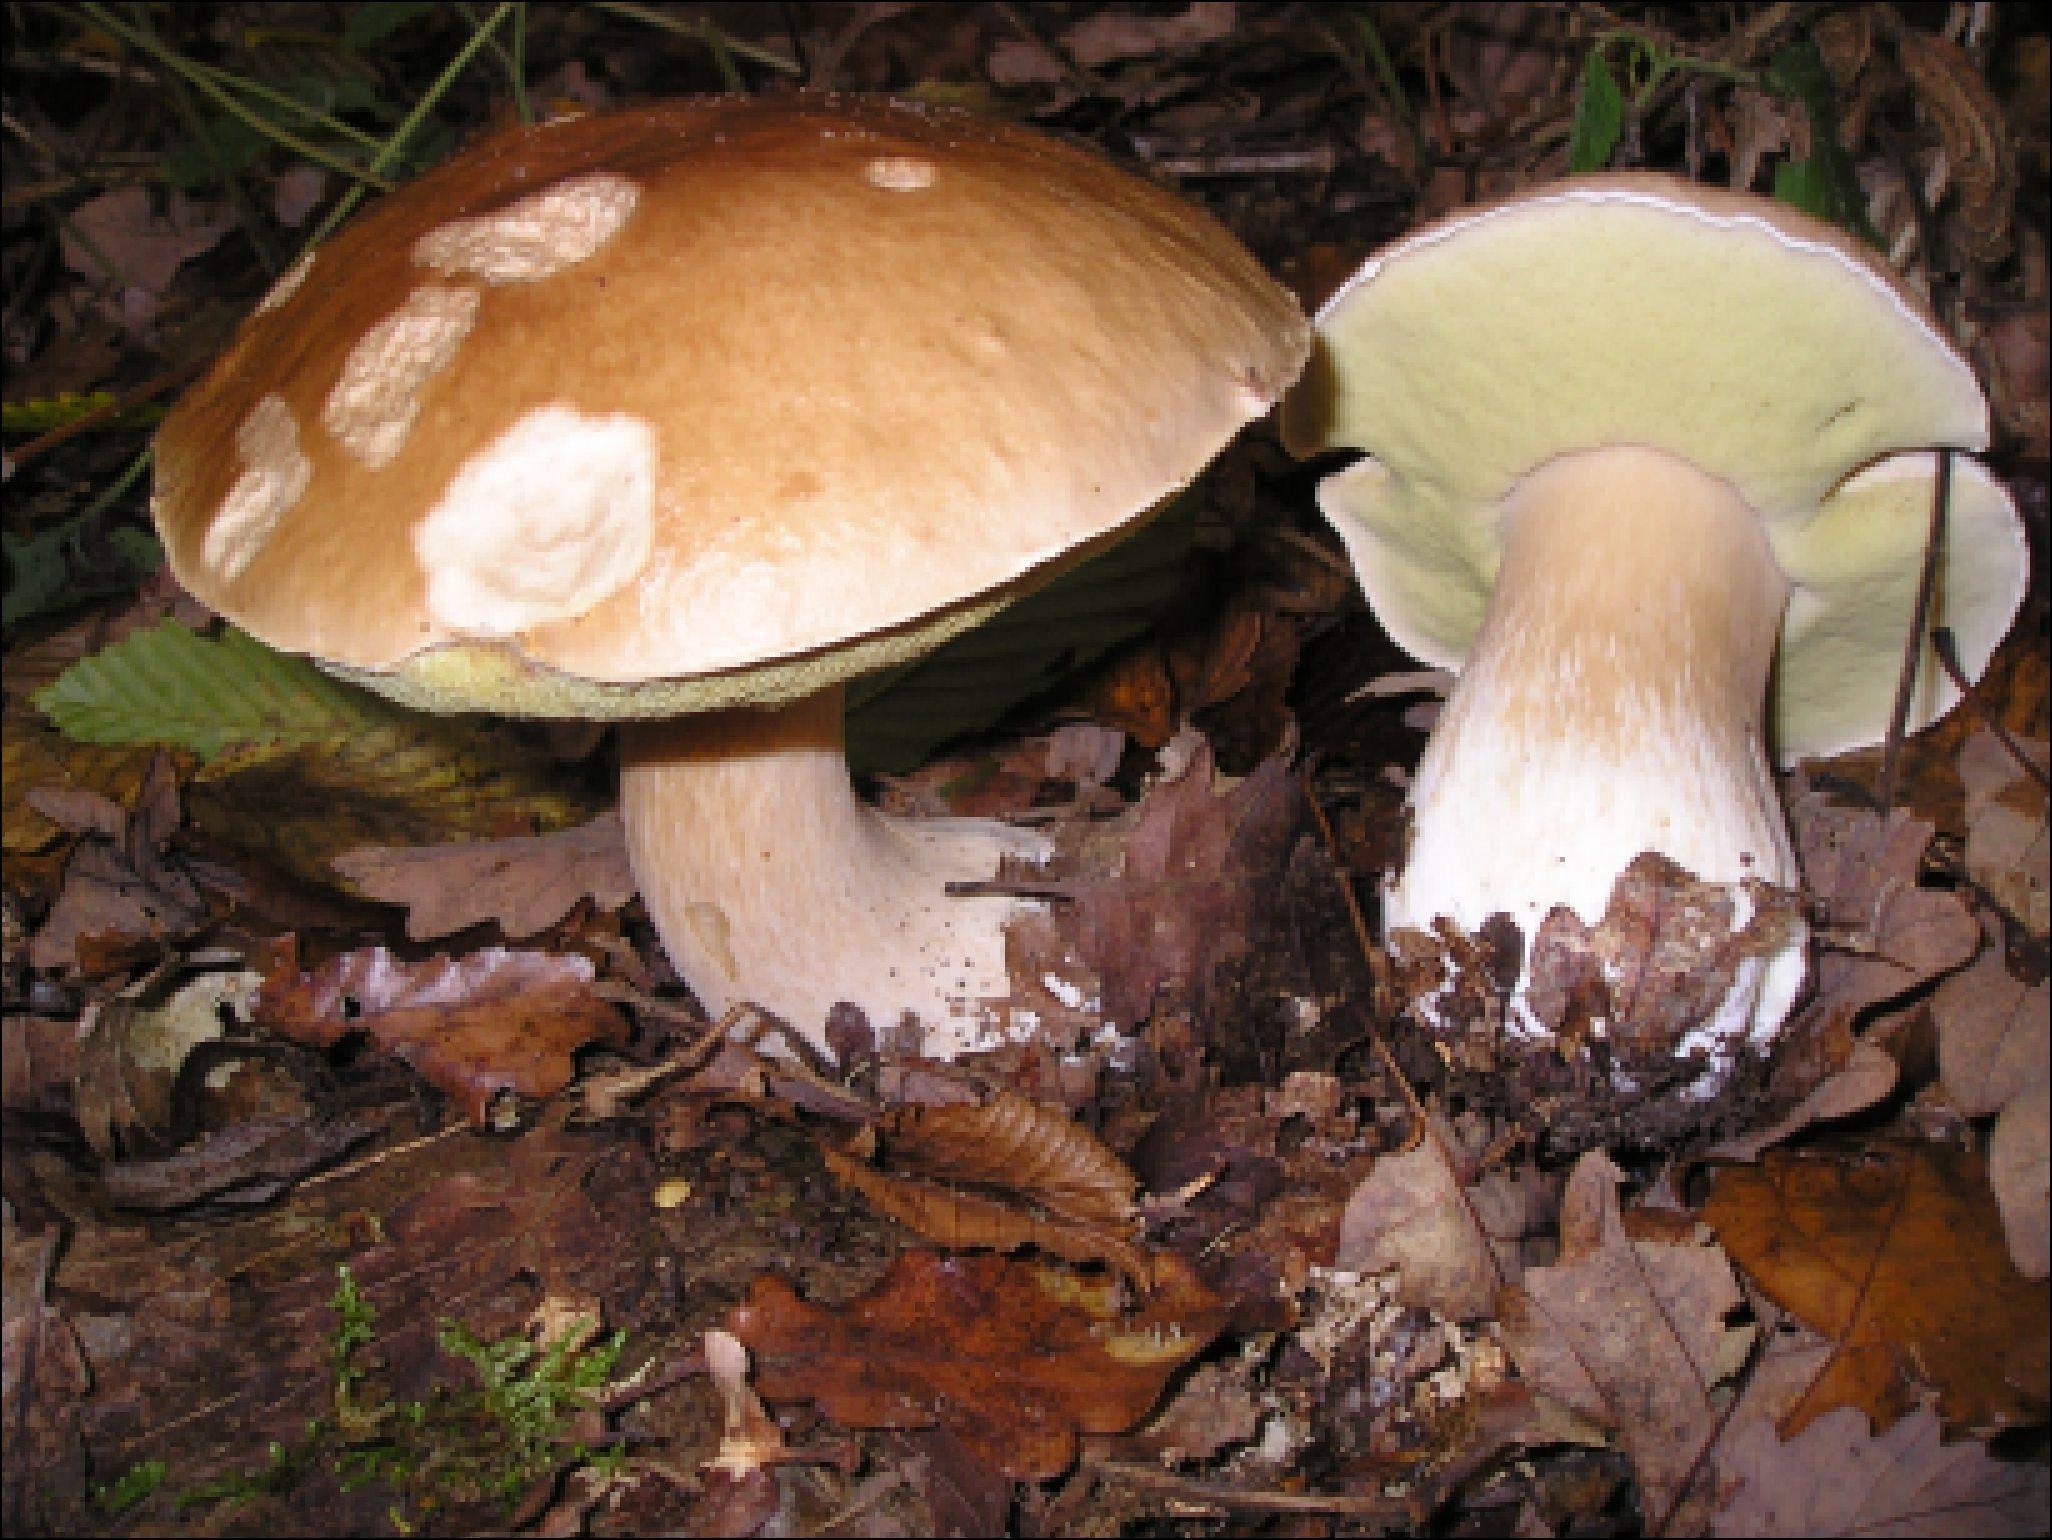 грибы башкирии фото